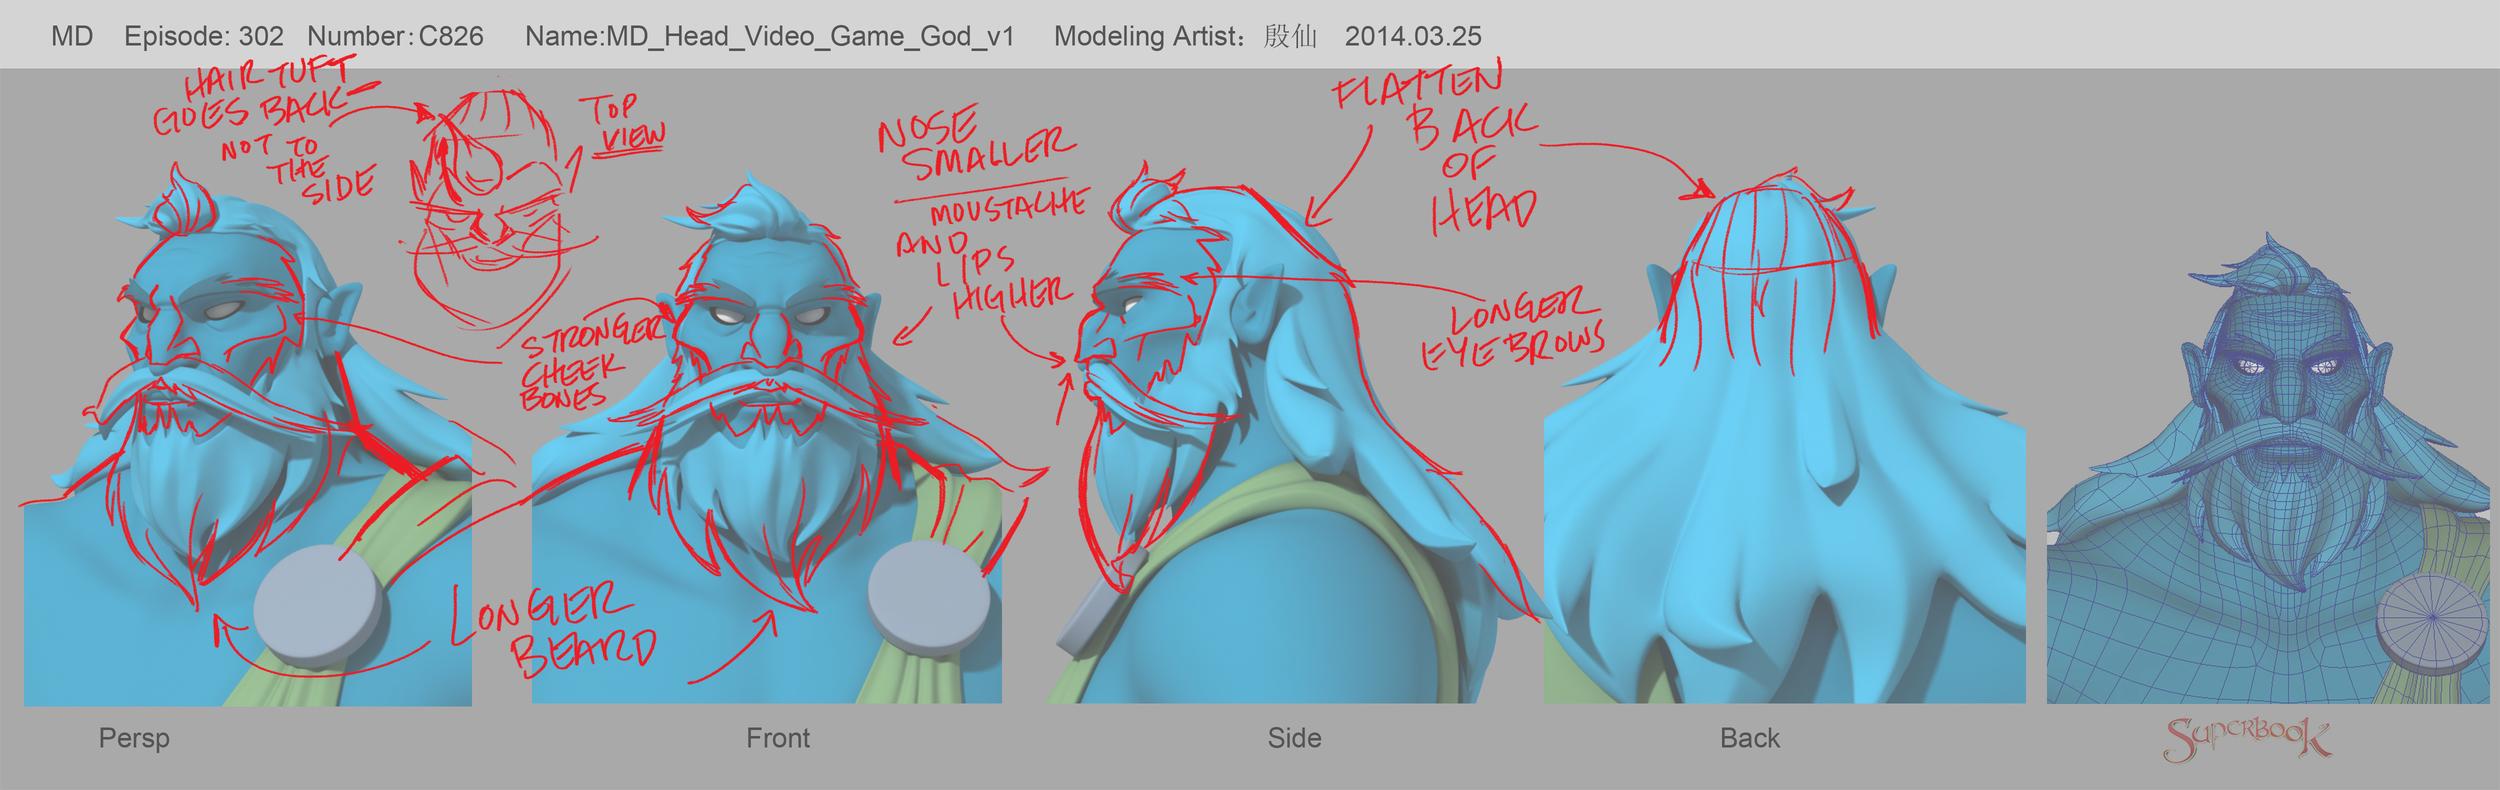 302_C826_Video_Game_God_Head_Model_V1(03262014)_TomNote.jpg